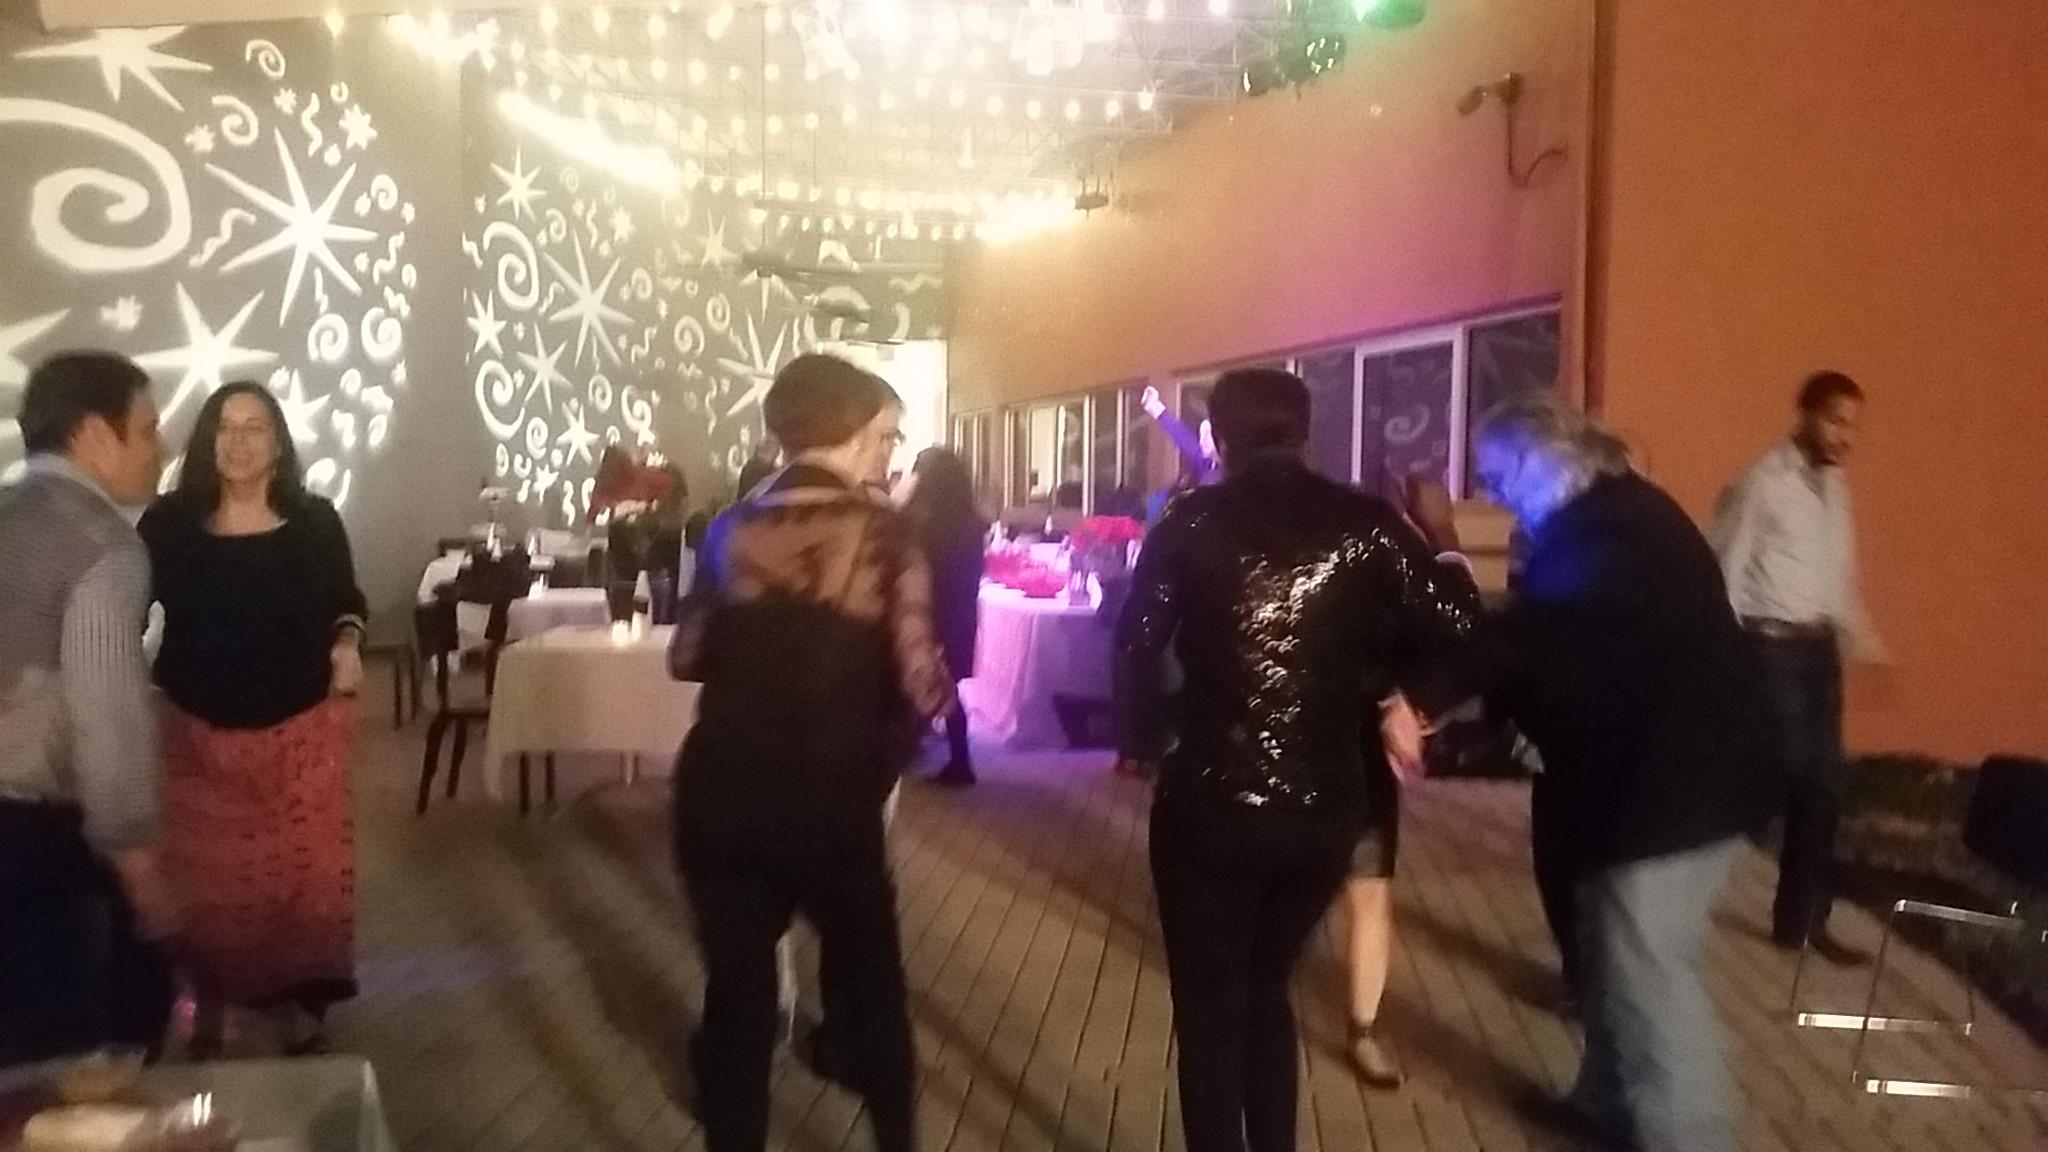 Party at MOCA Description